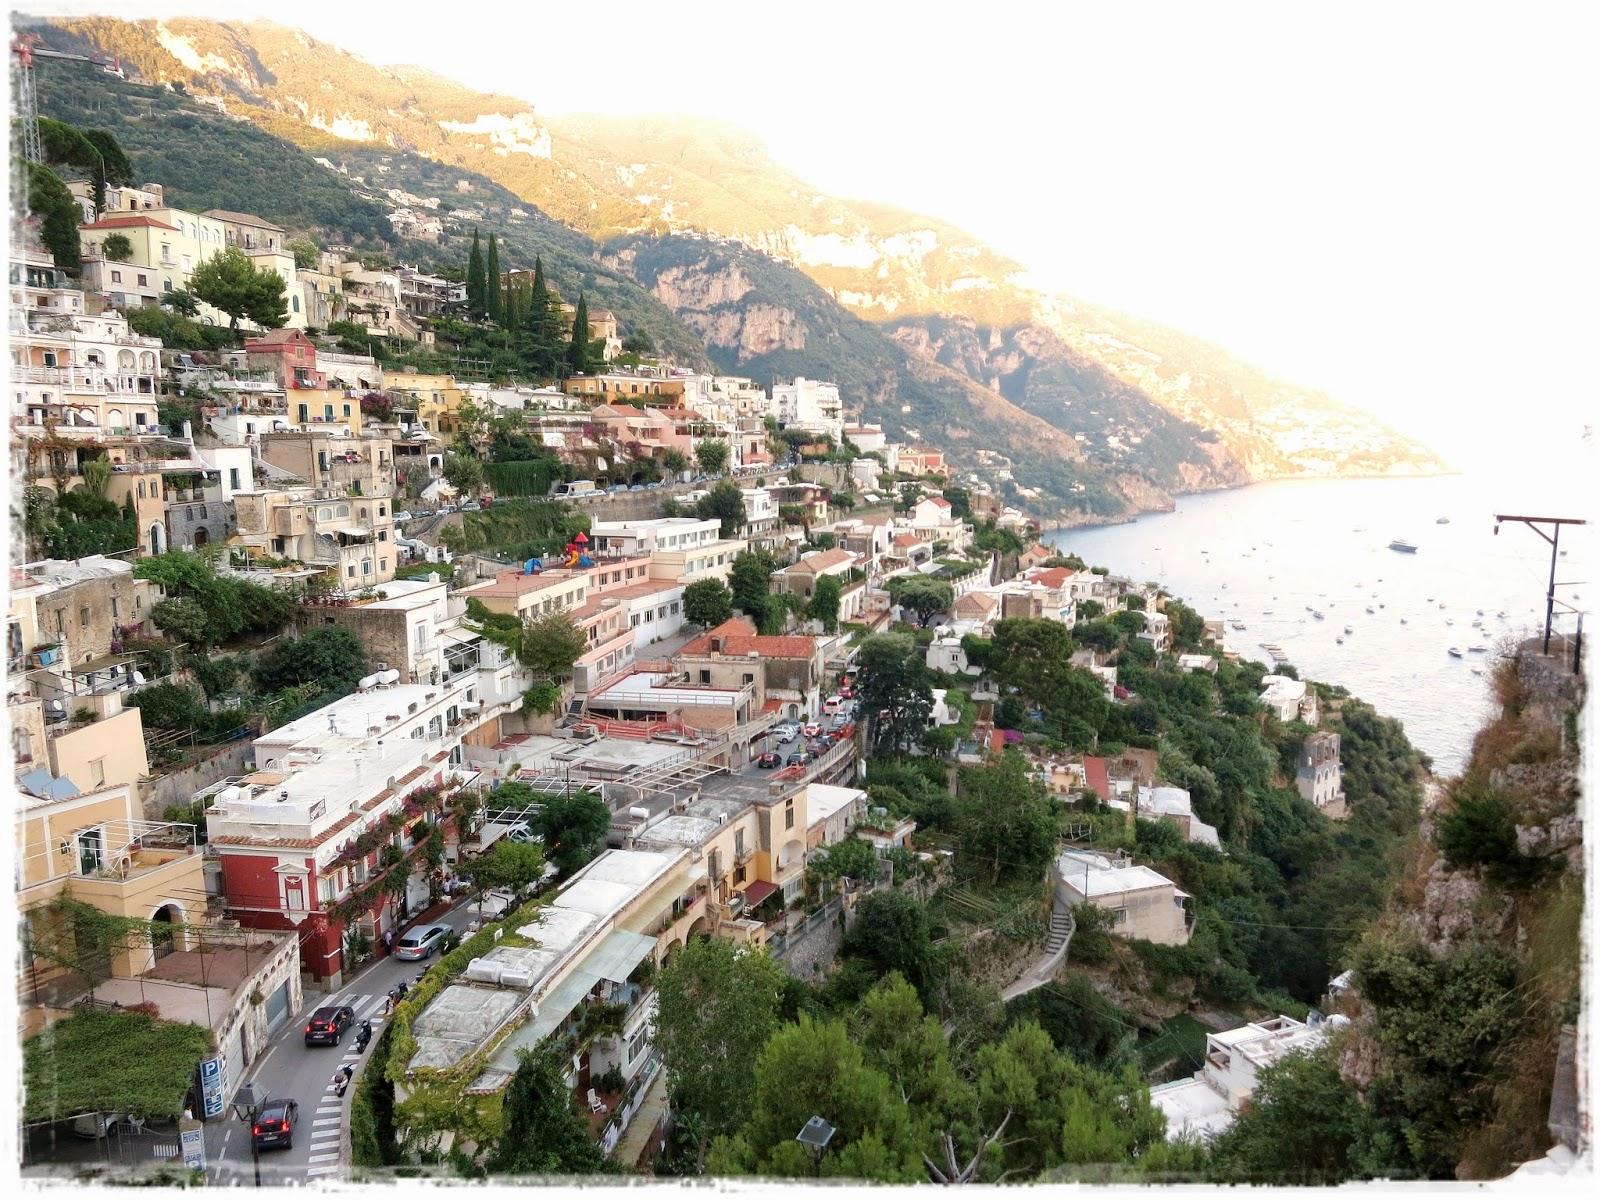 Paperesse clinging to the amalfi coast in positano italy for Amalfi to positano